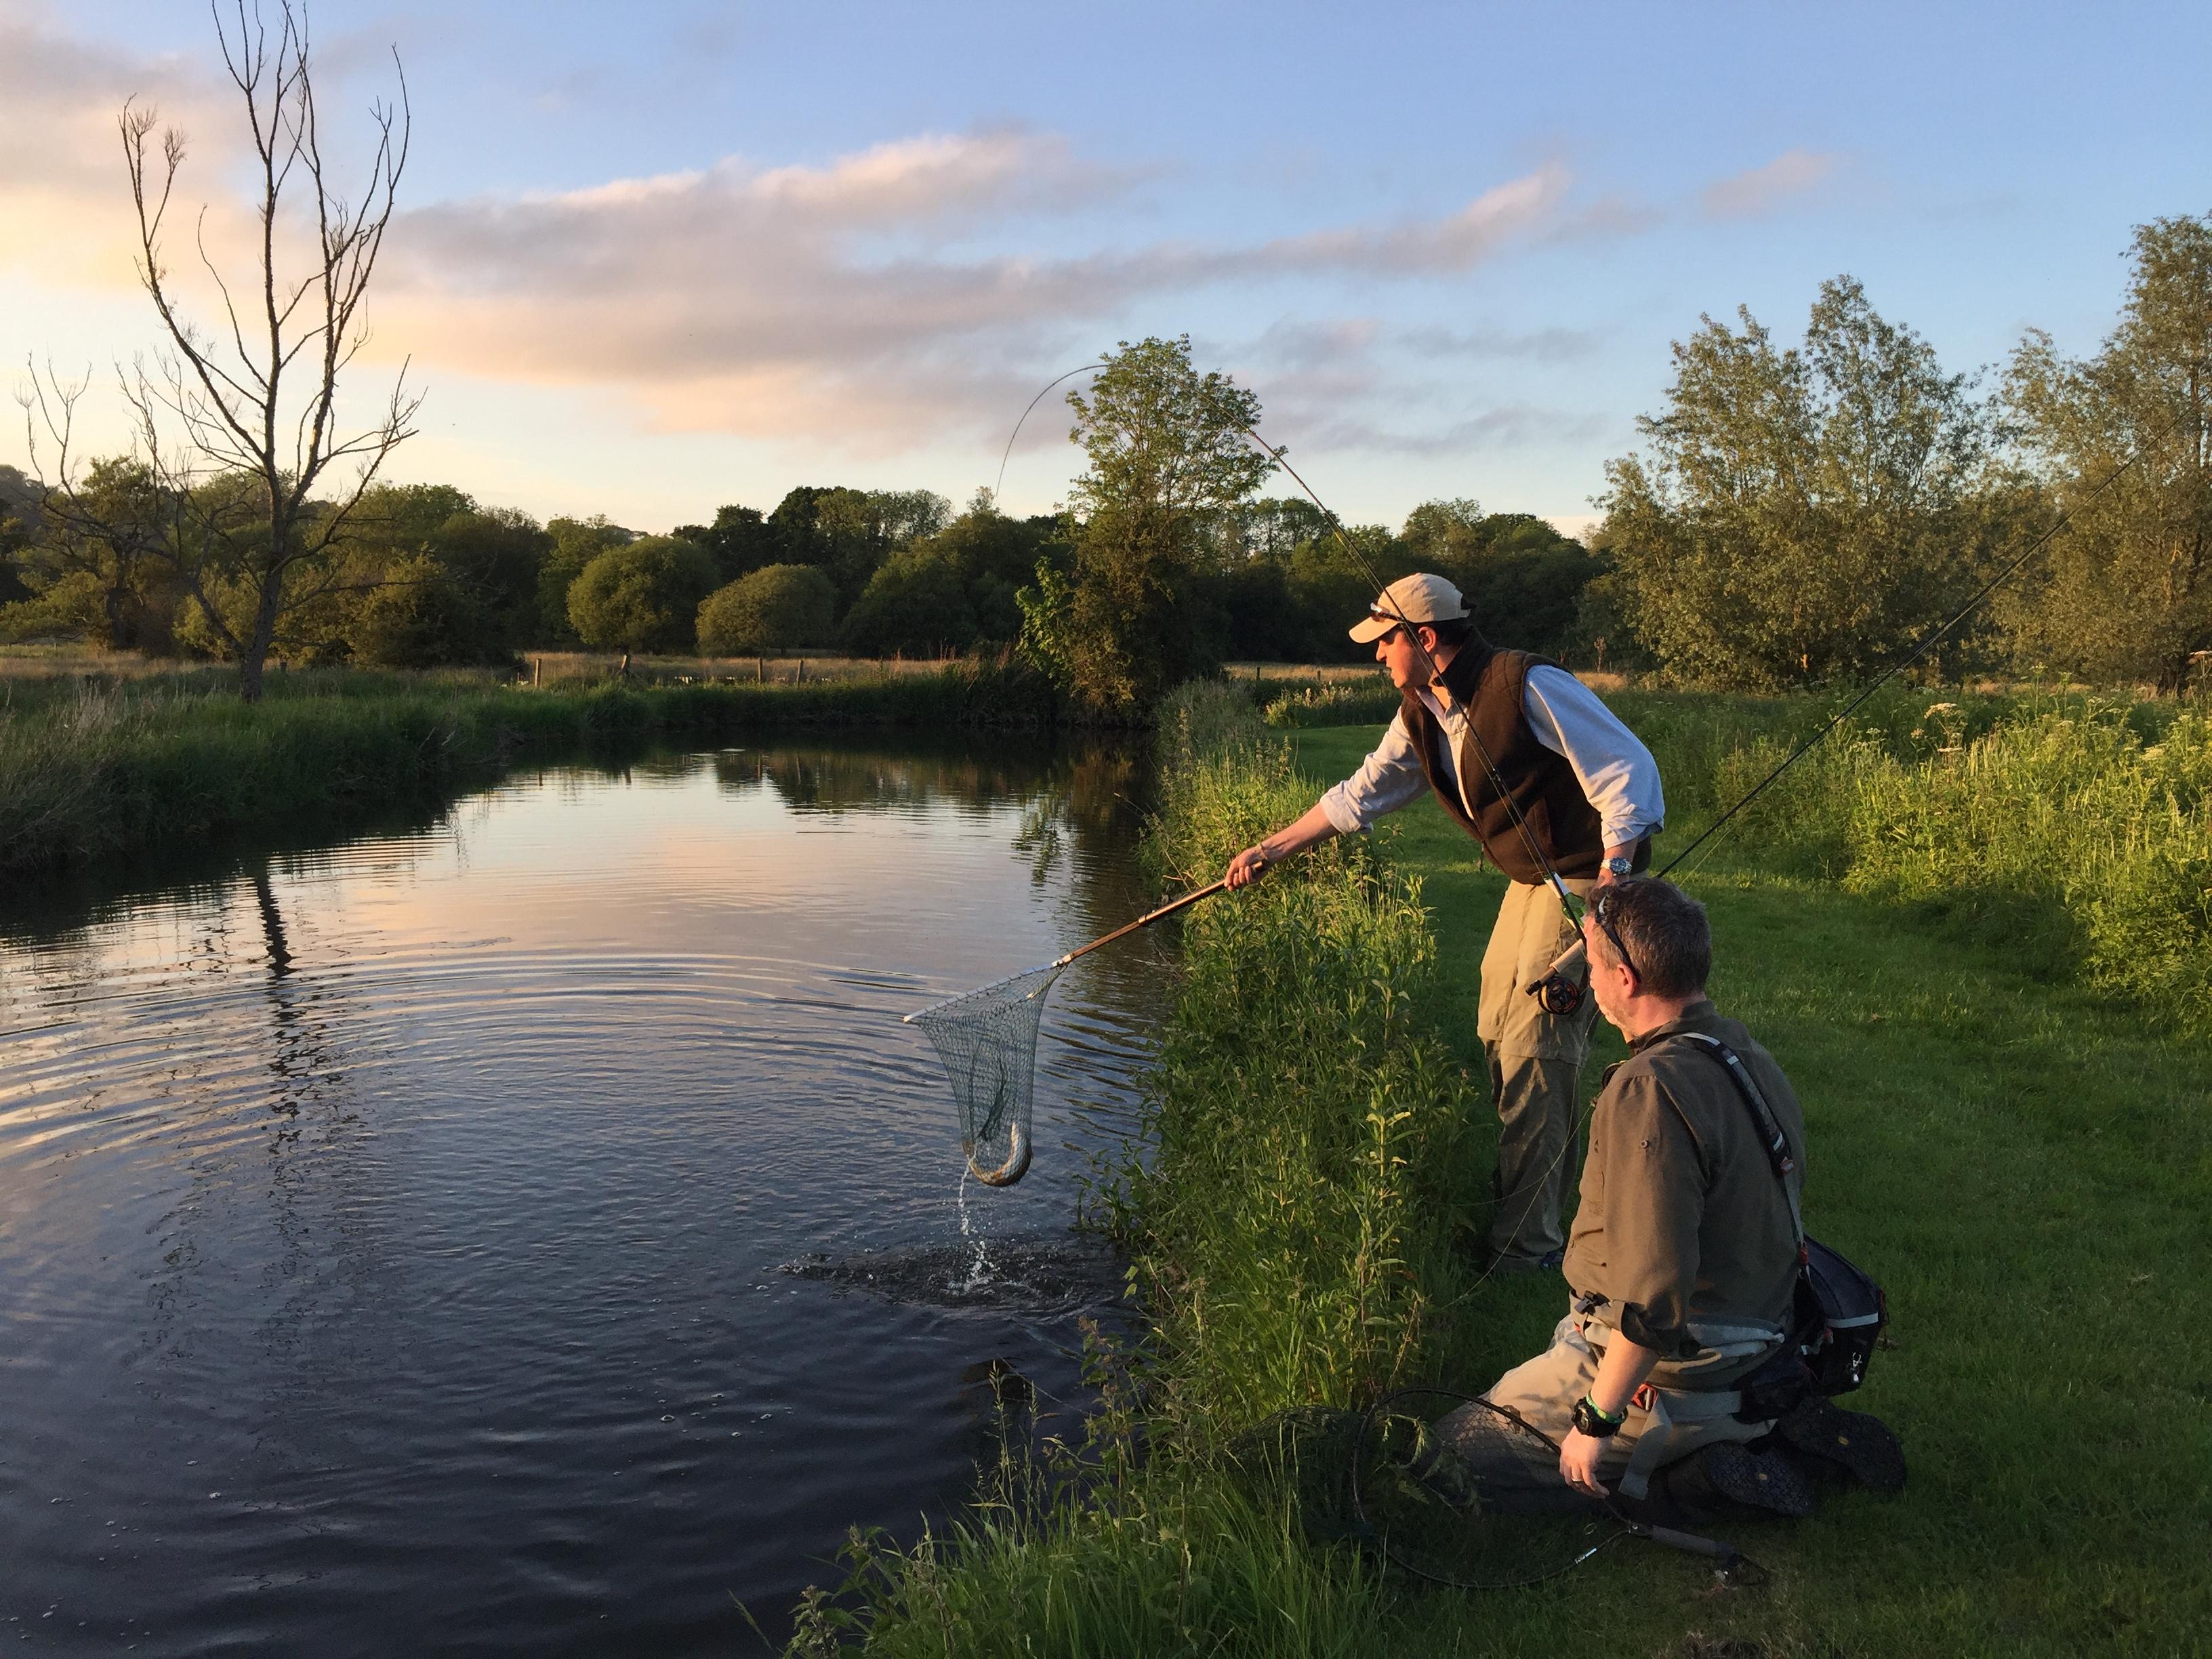 UK Fishing, Chalkstream, River Nadder, Trout fishing, chalkstreams